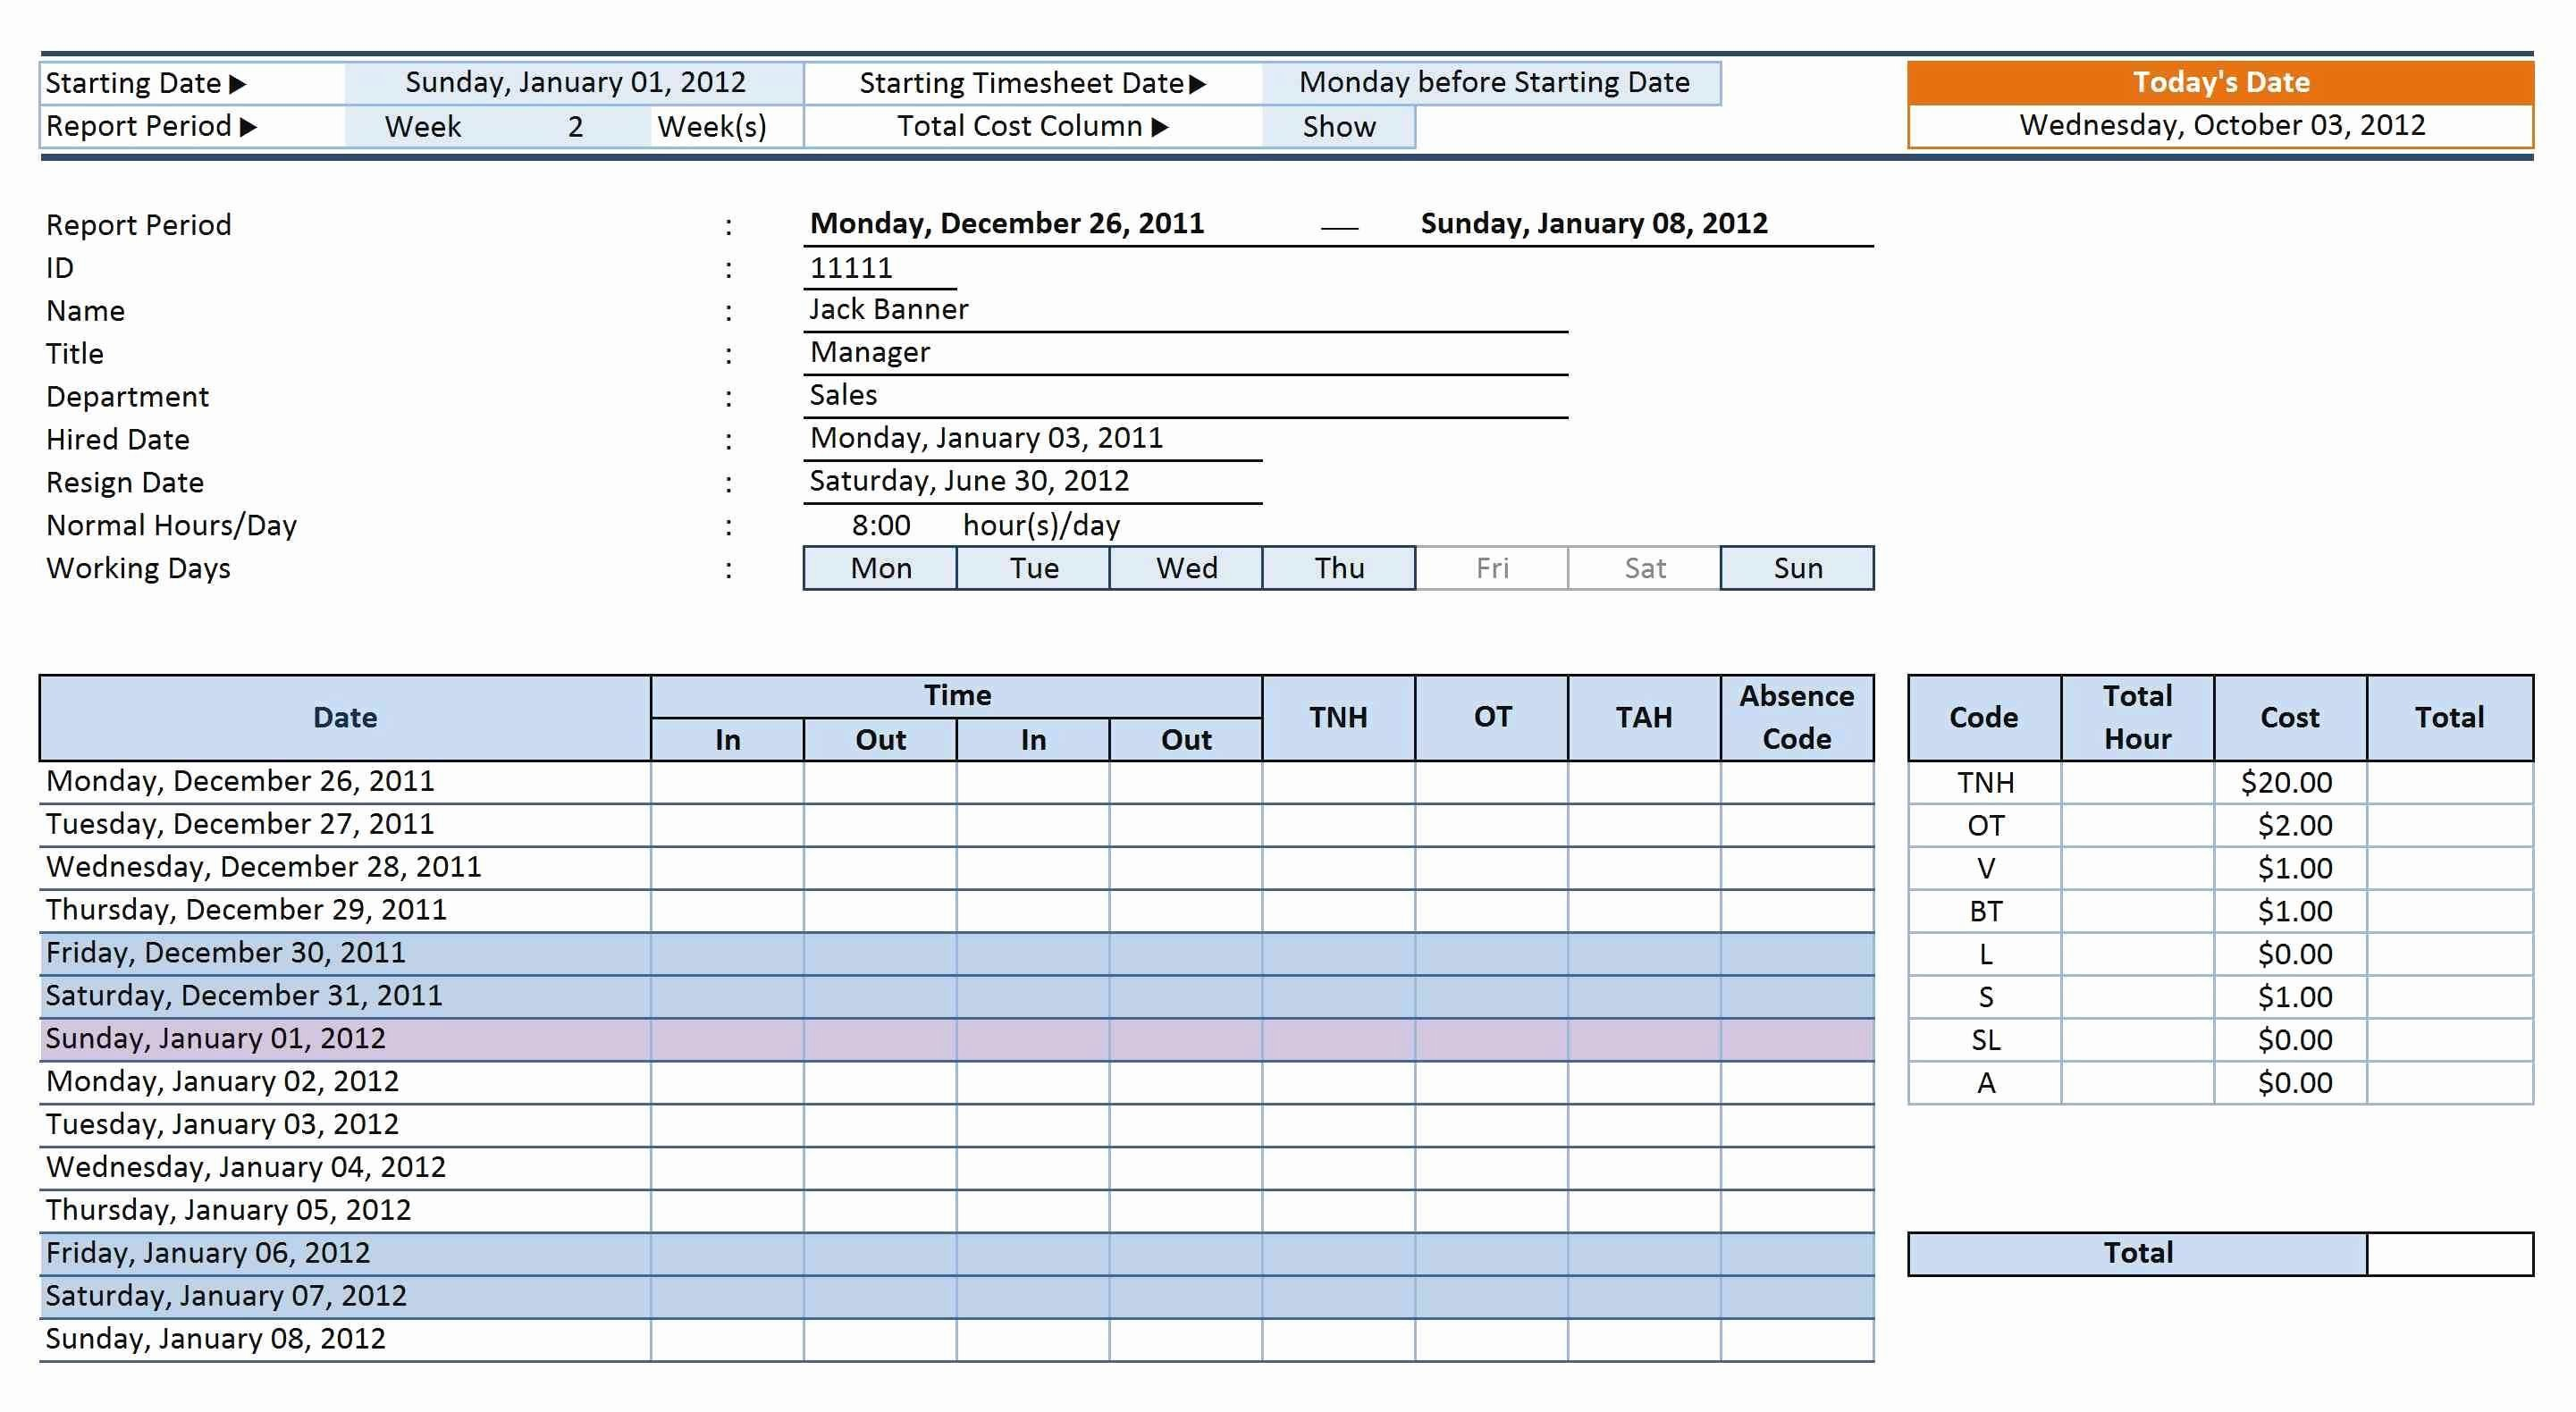 Employee Performance Tracking Template Elegant Employee Performance Review Template Excel Unique